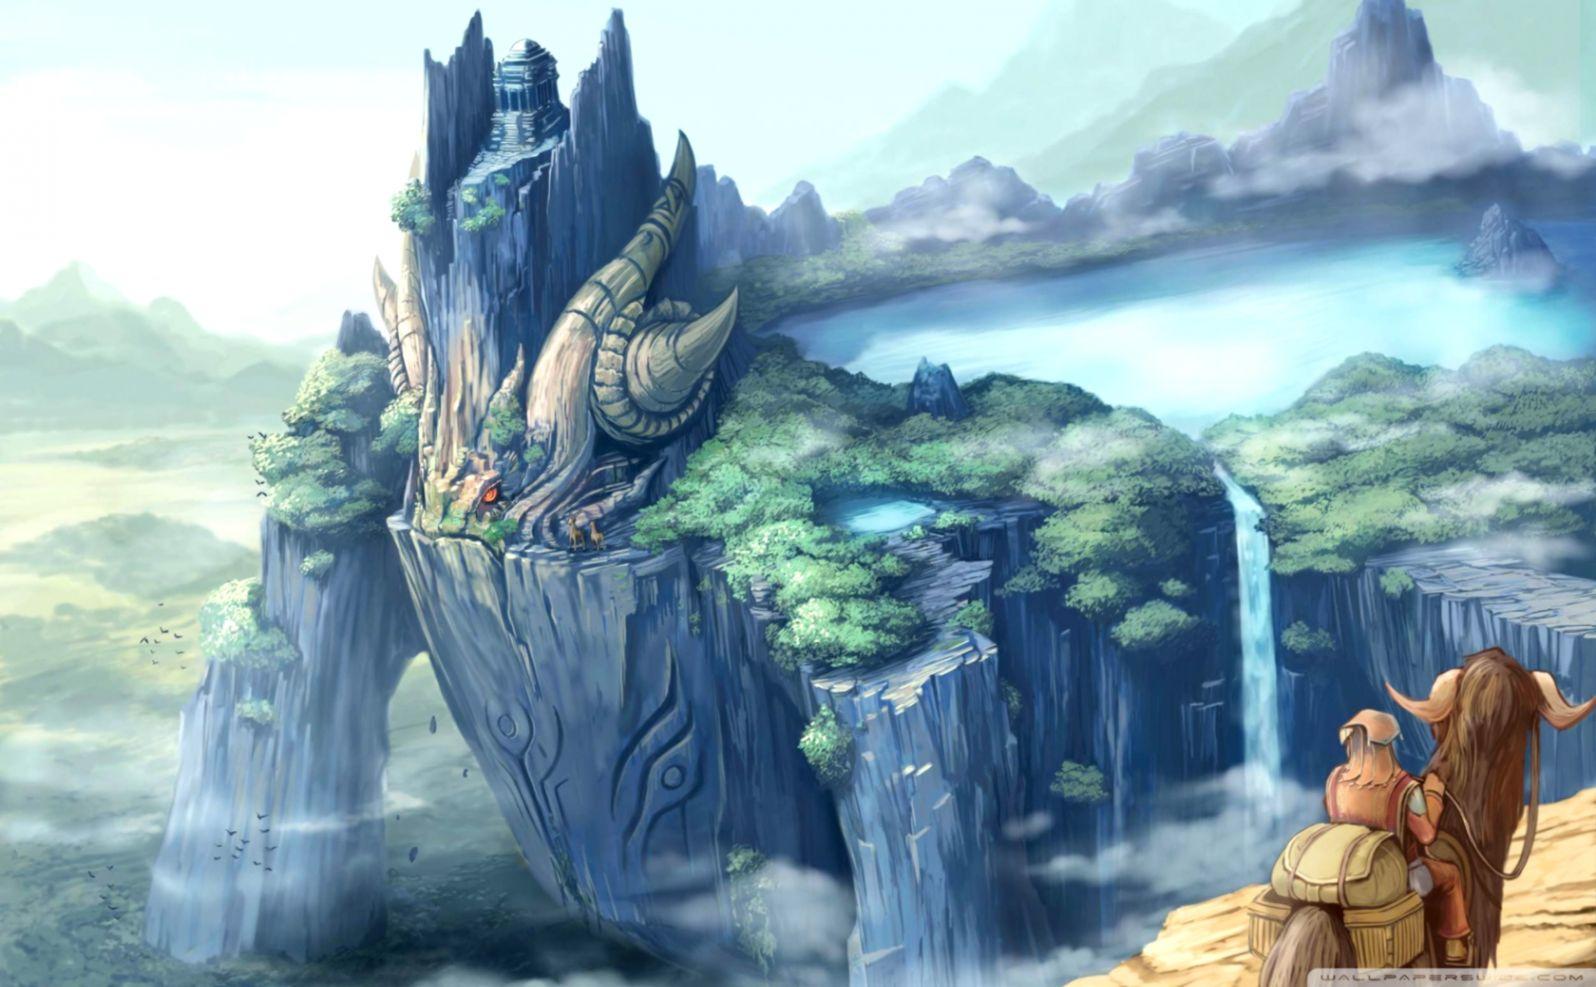 Dreamy Fantasy Castles Dragons Wallpaper Carik Wallpapers